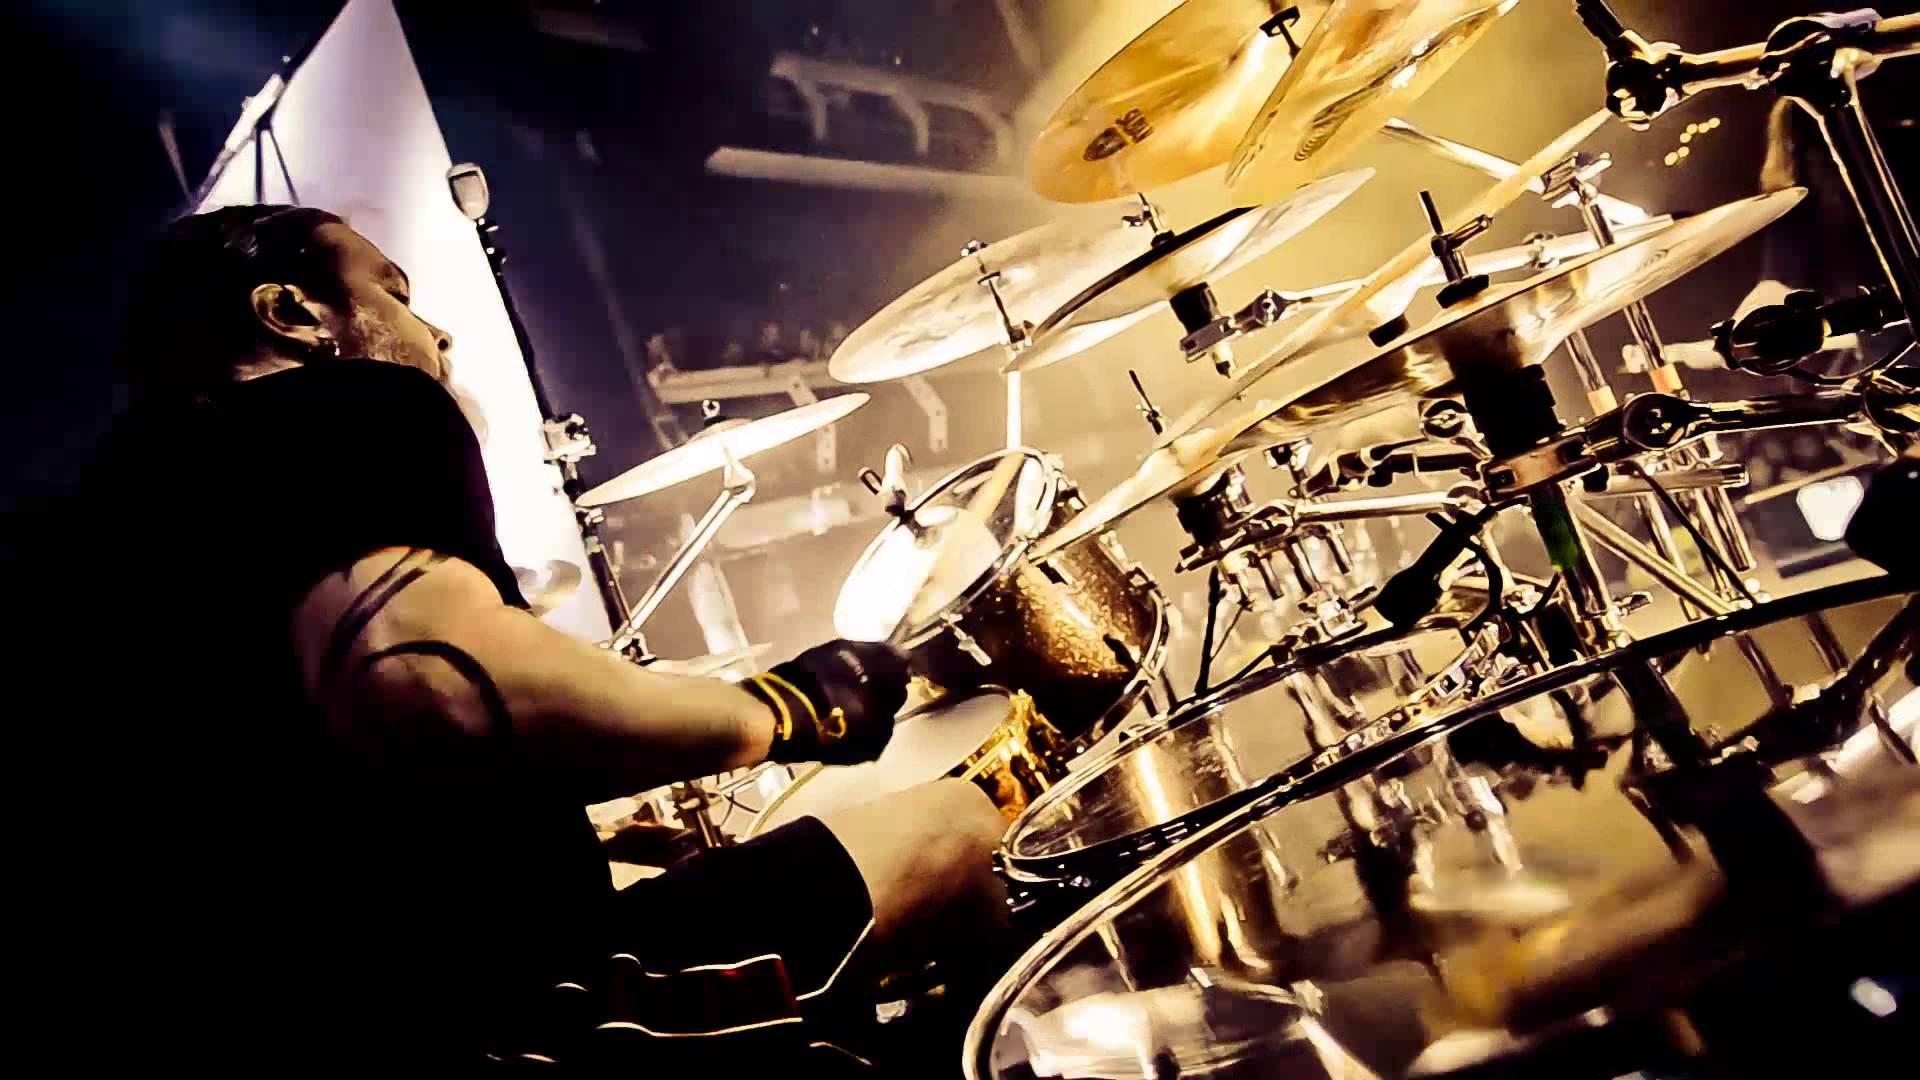 Tomas Haake [Meshuggah] DRUMCAM LIVE 1920x1080